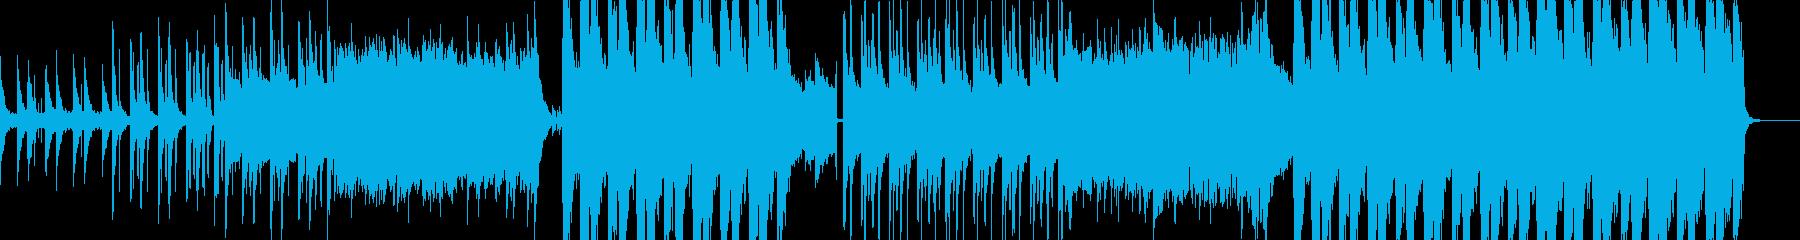 Chainsmokesr風のエモいEDMの再生済みの波形